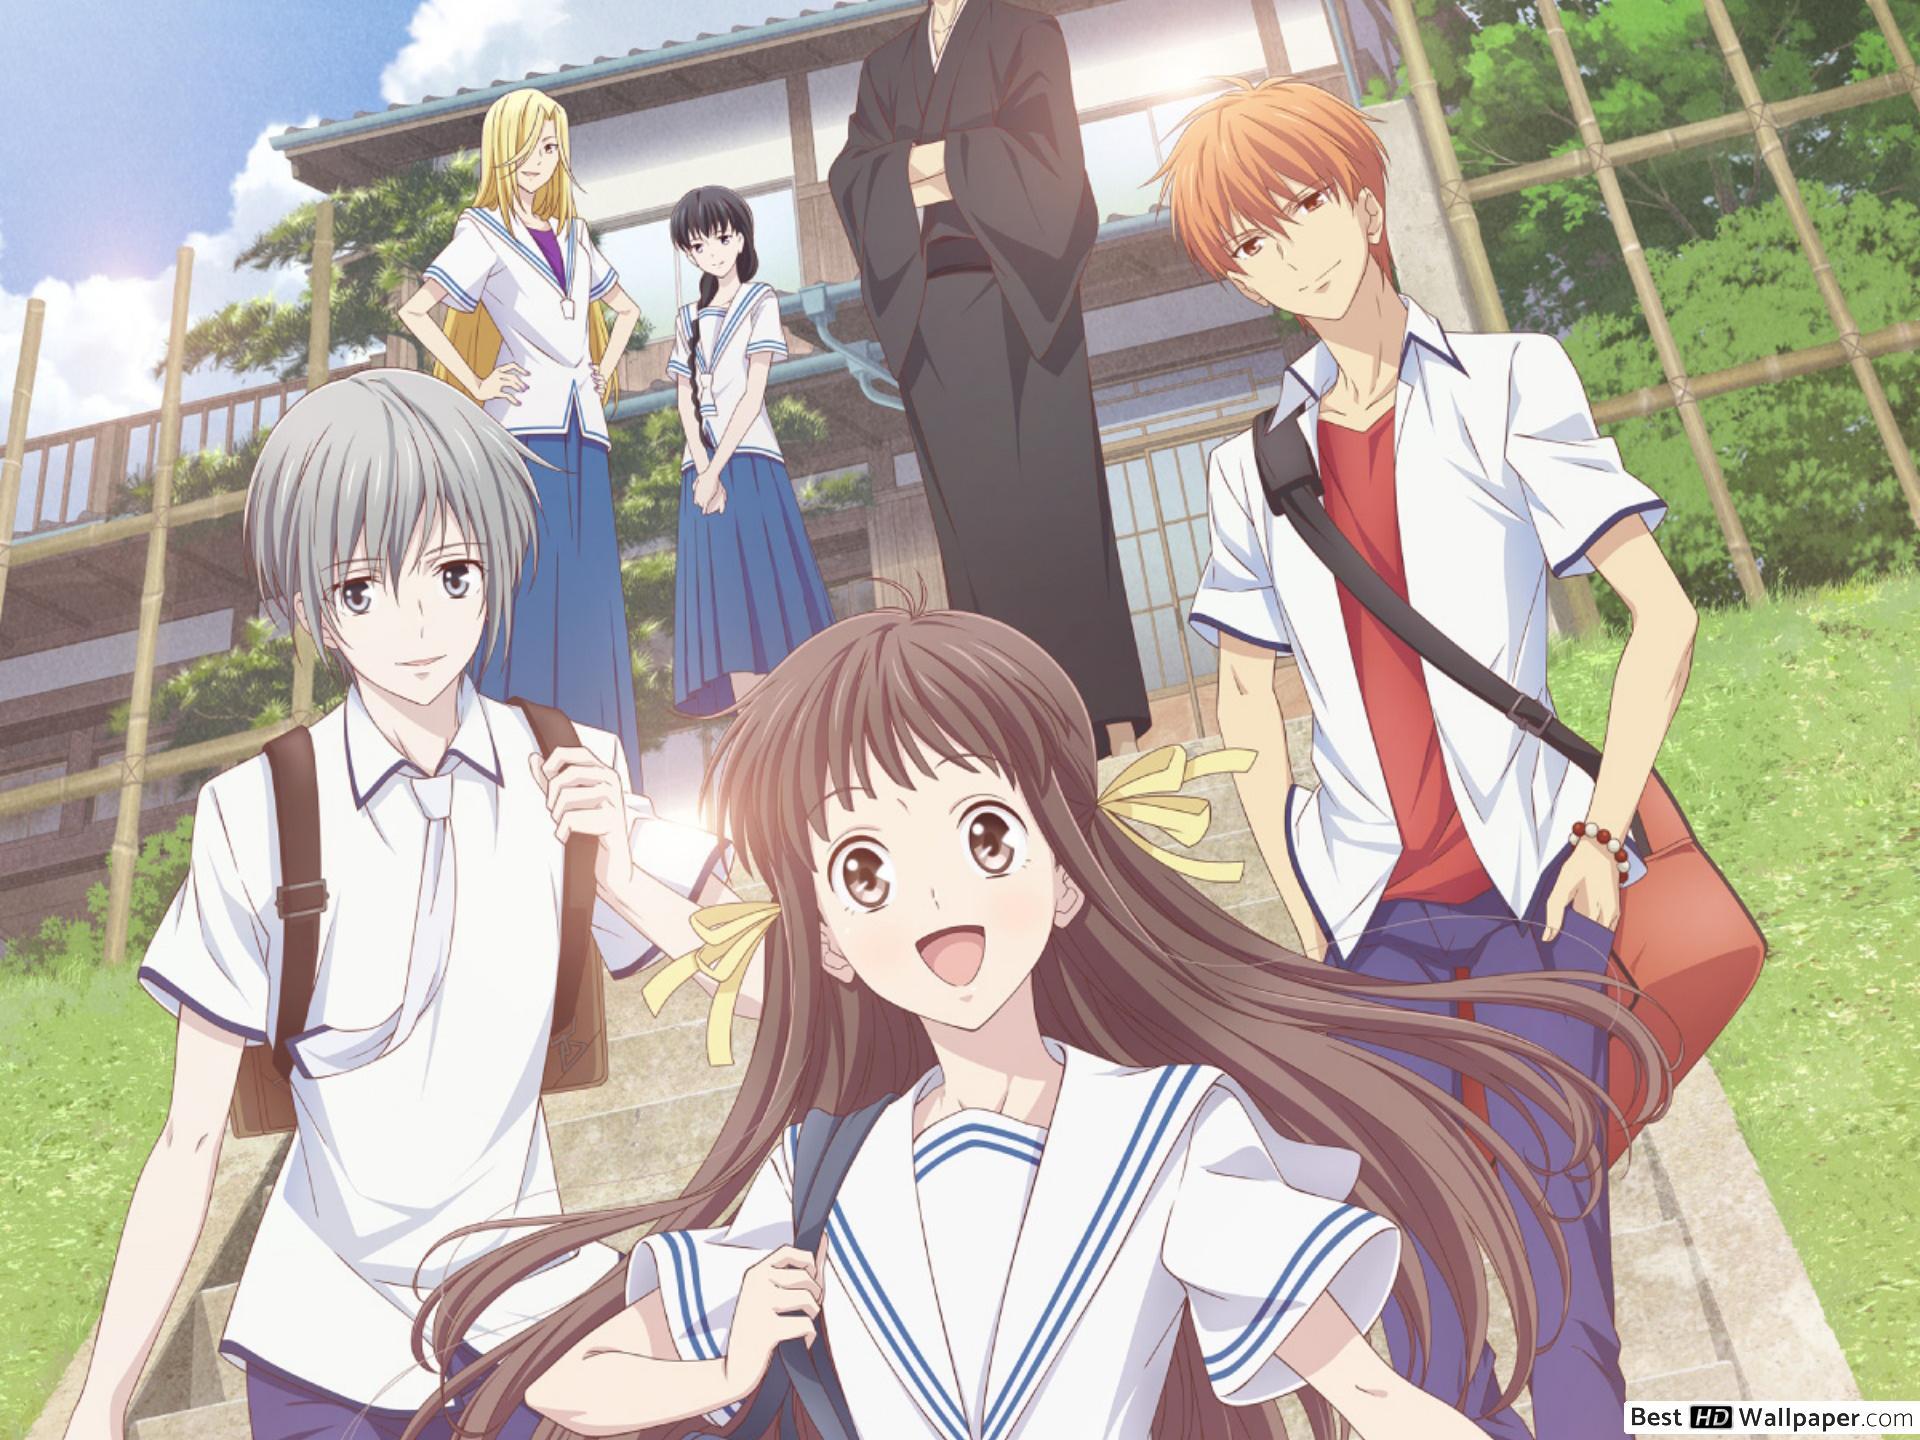 Fruit Basket Anime 2019 3078737 Hd Wallpaper Backgrounds Download